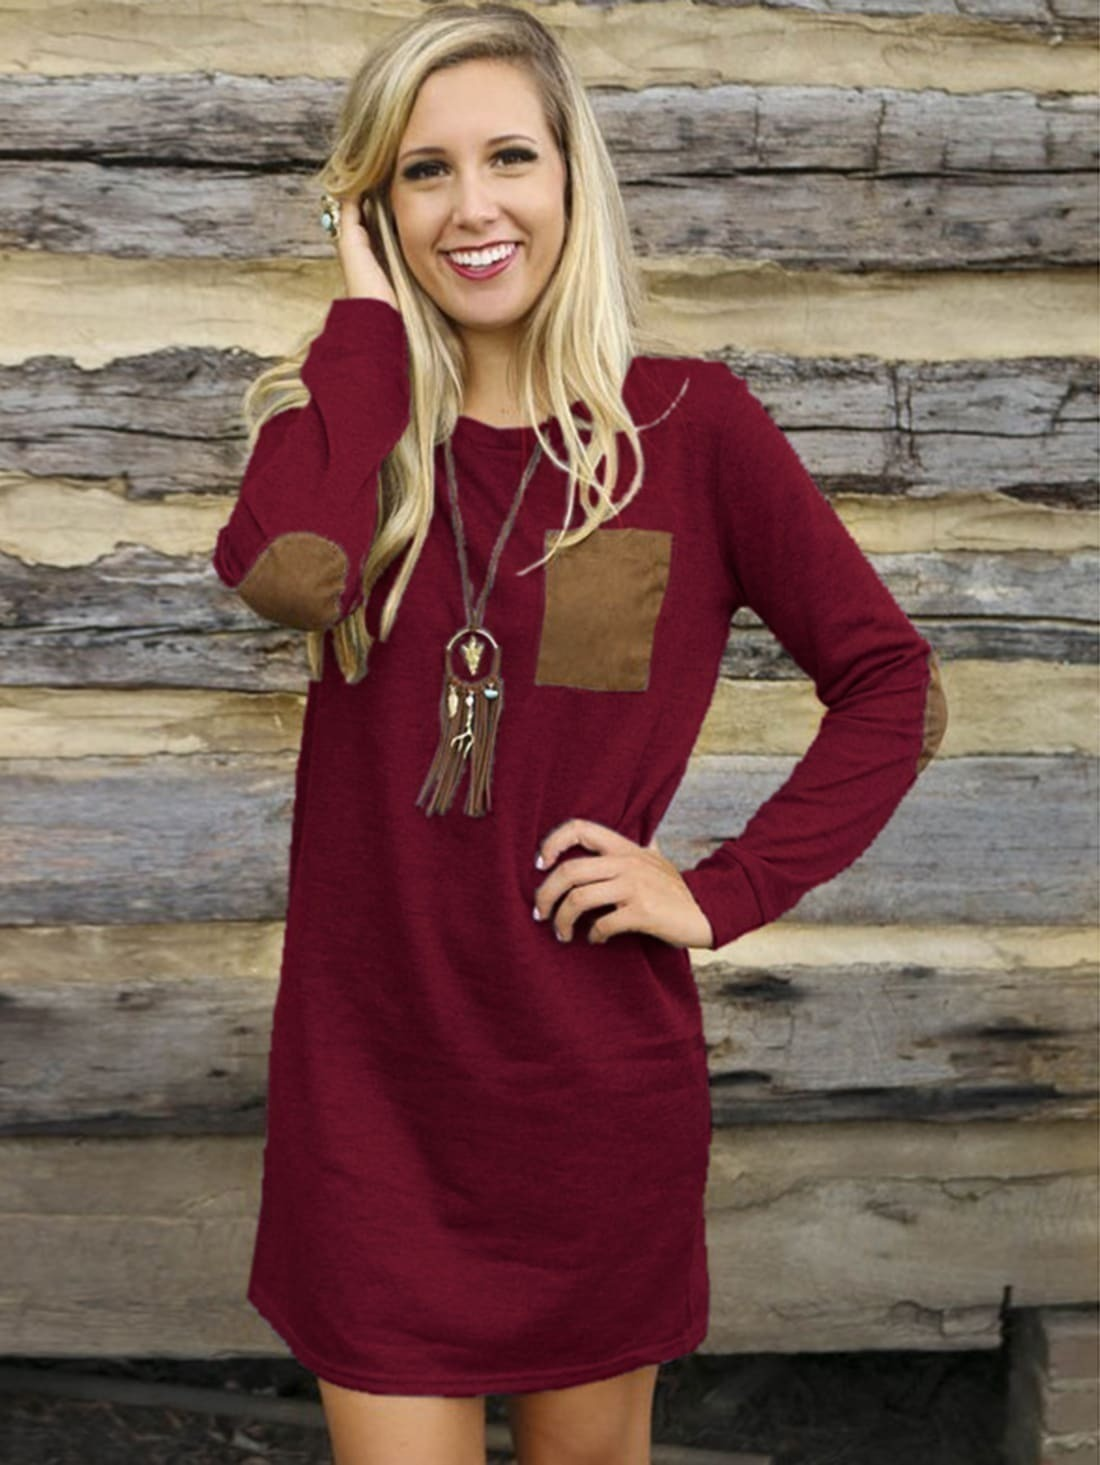 b184513396 Burgundy Long Sleeve Elbow Patch Dress EmmaCloth-Women Fast ...